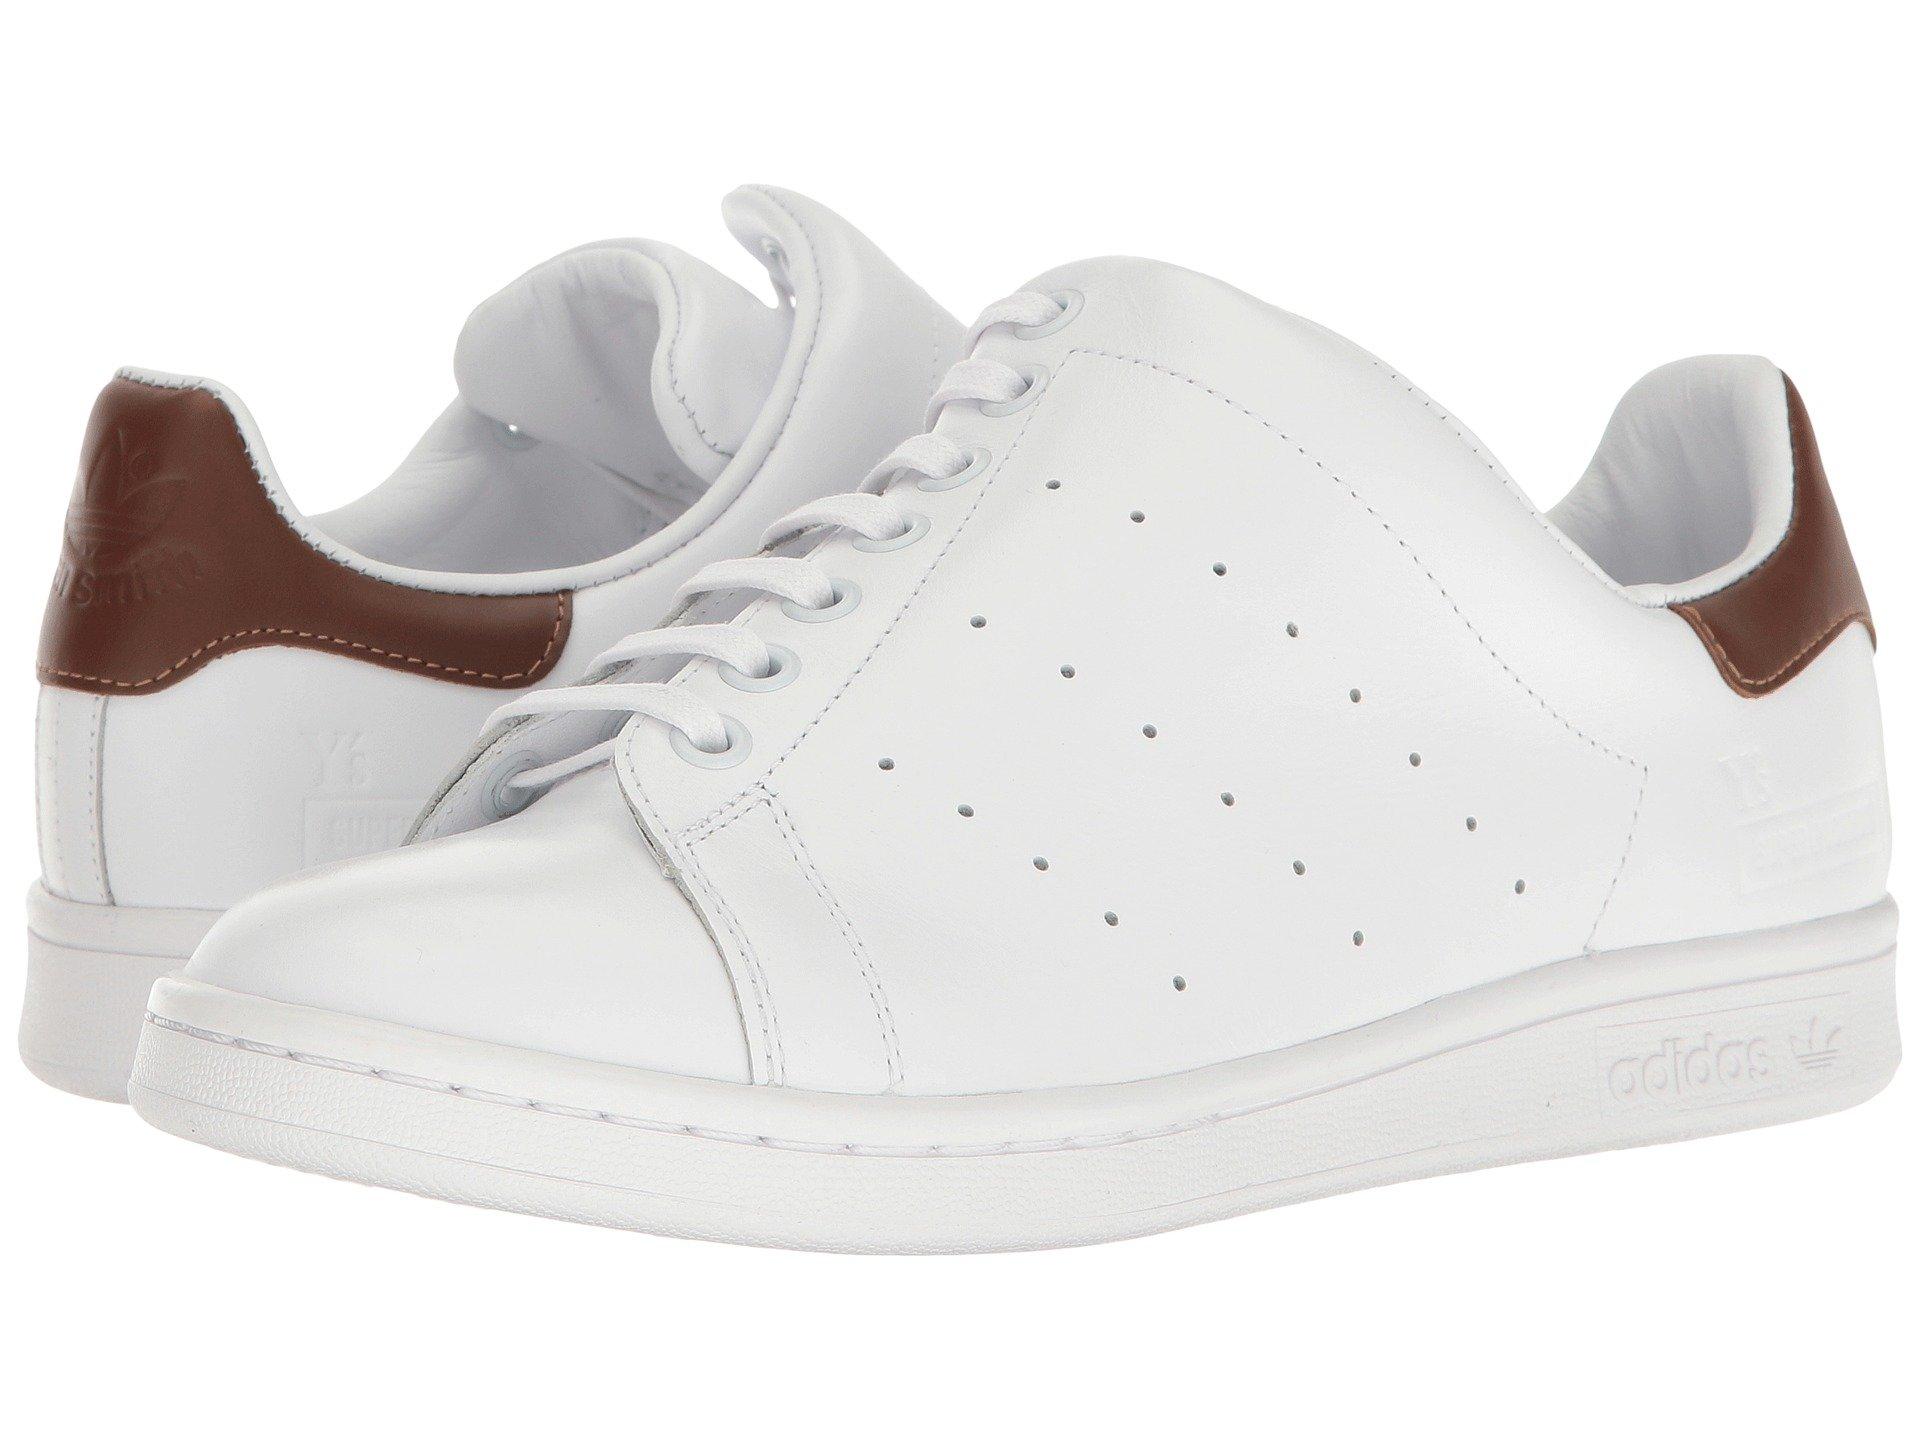 Kenzo Blue adidas Originals Edition Diagonal Stan Smith Sneakers B6h0k14N